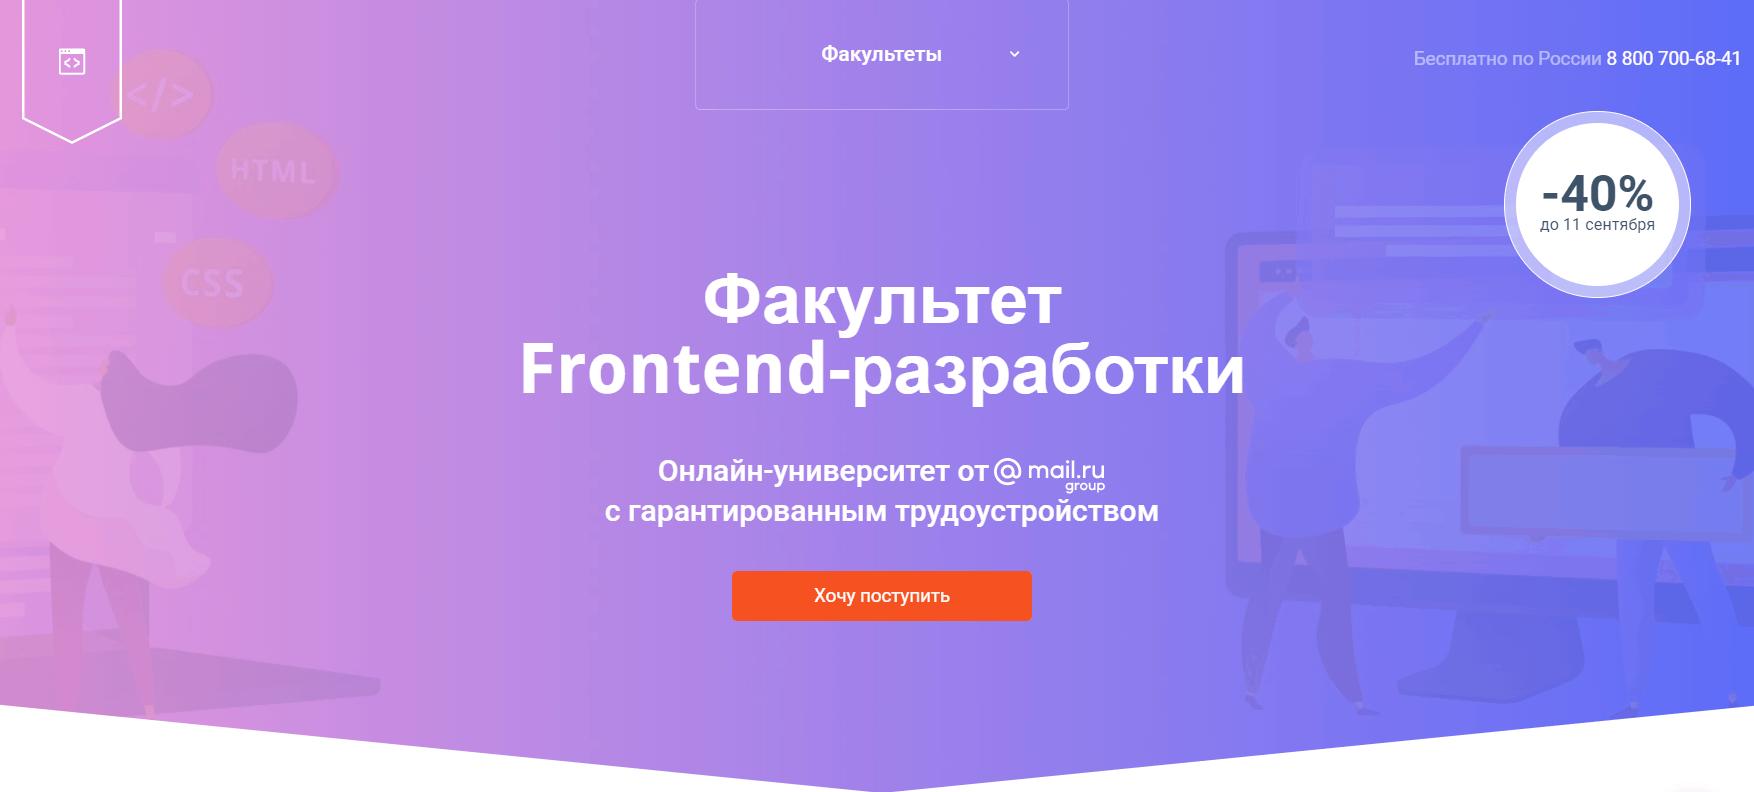 Факультет Frontend-разработки от GeekBrains